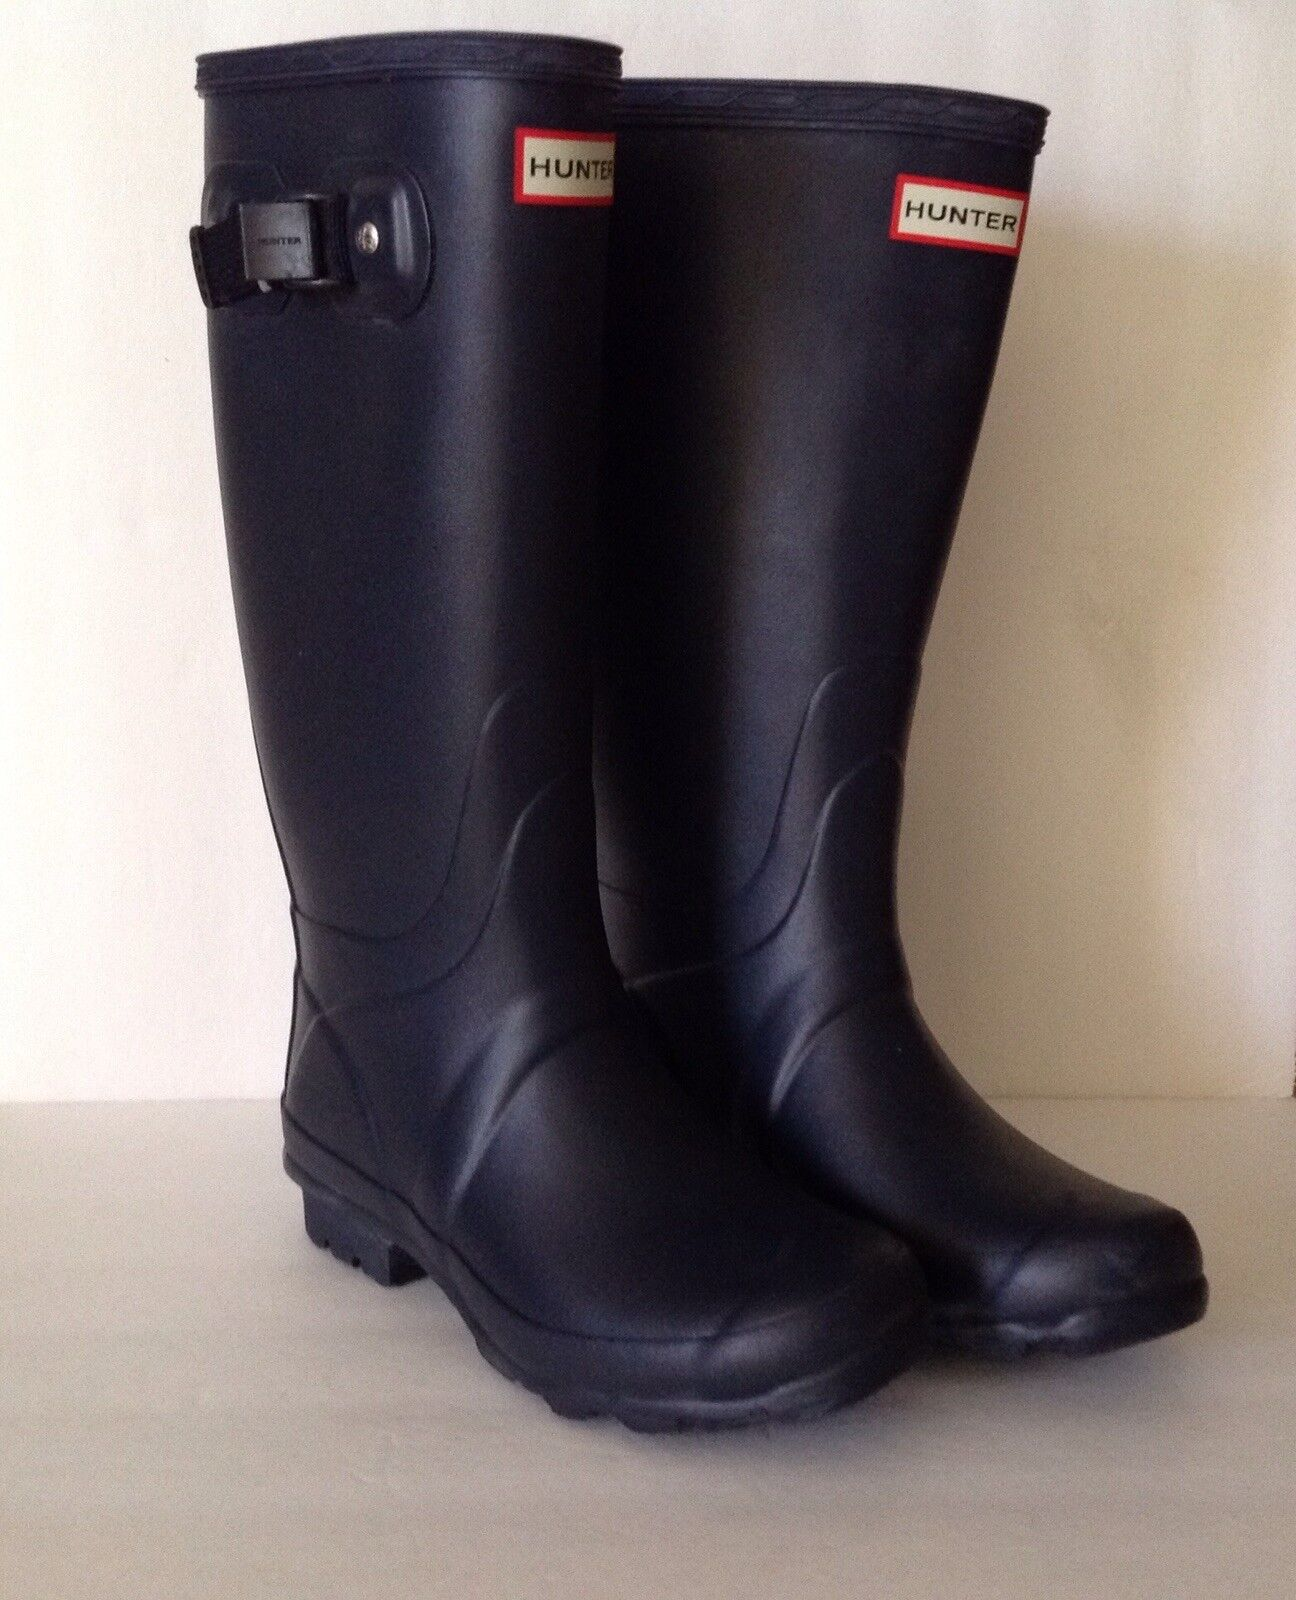 Hunter 'Norris Field' Boot Rain Black Black Black Mate (Women) SZ 5M  160.00 5d2251